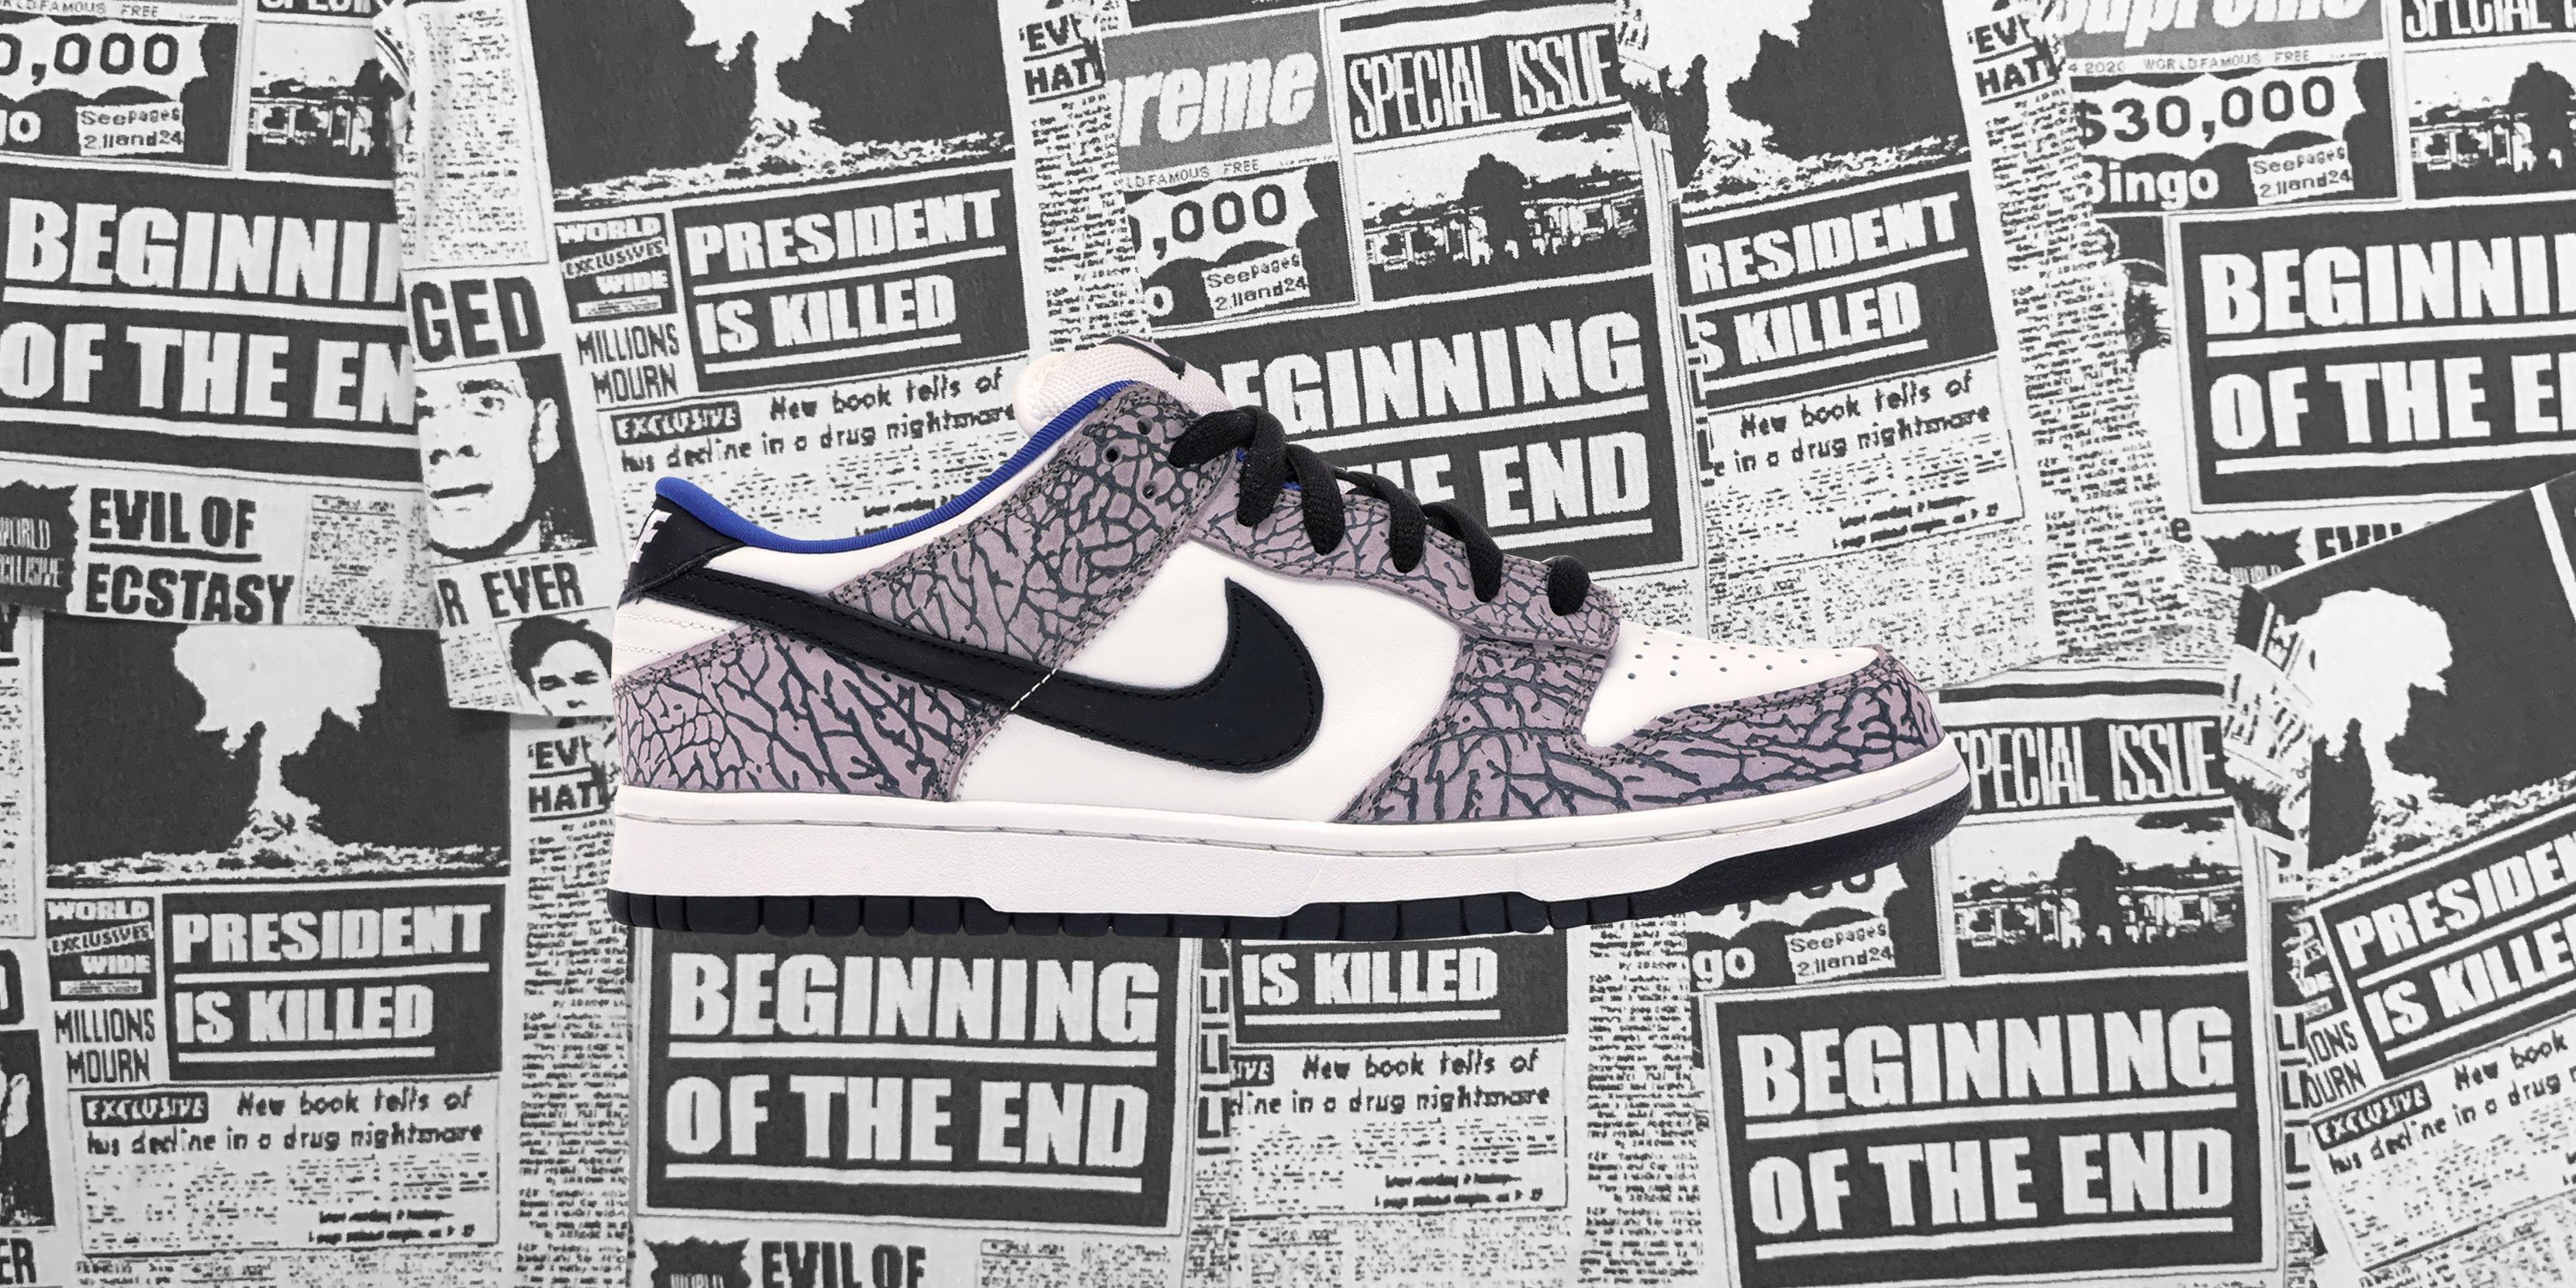 b08ca6855cb Cop the drop: Supreme x Nike Dunk Low SB White Cement sneaker